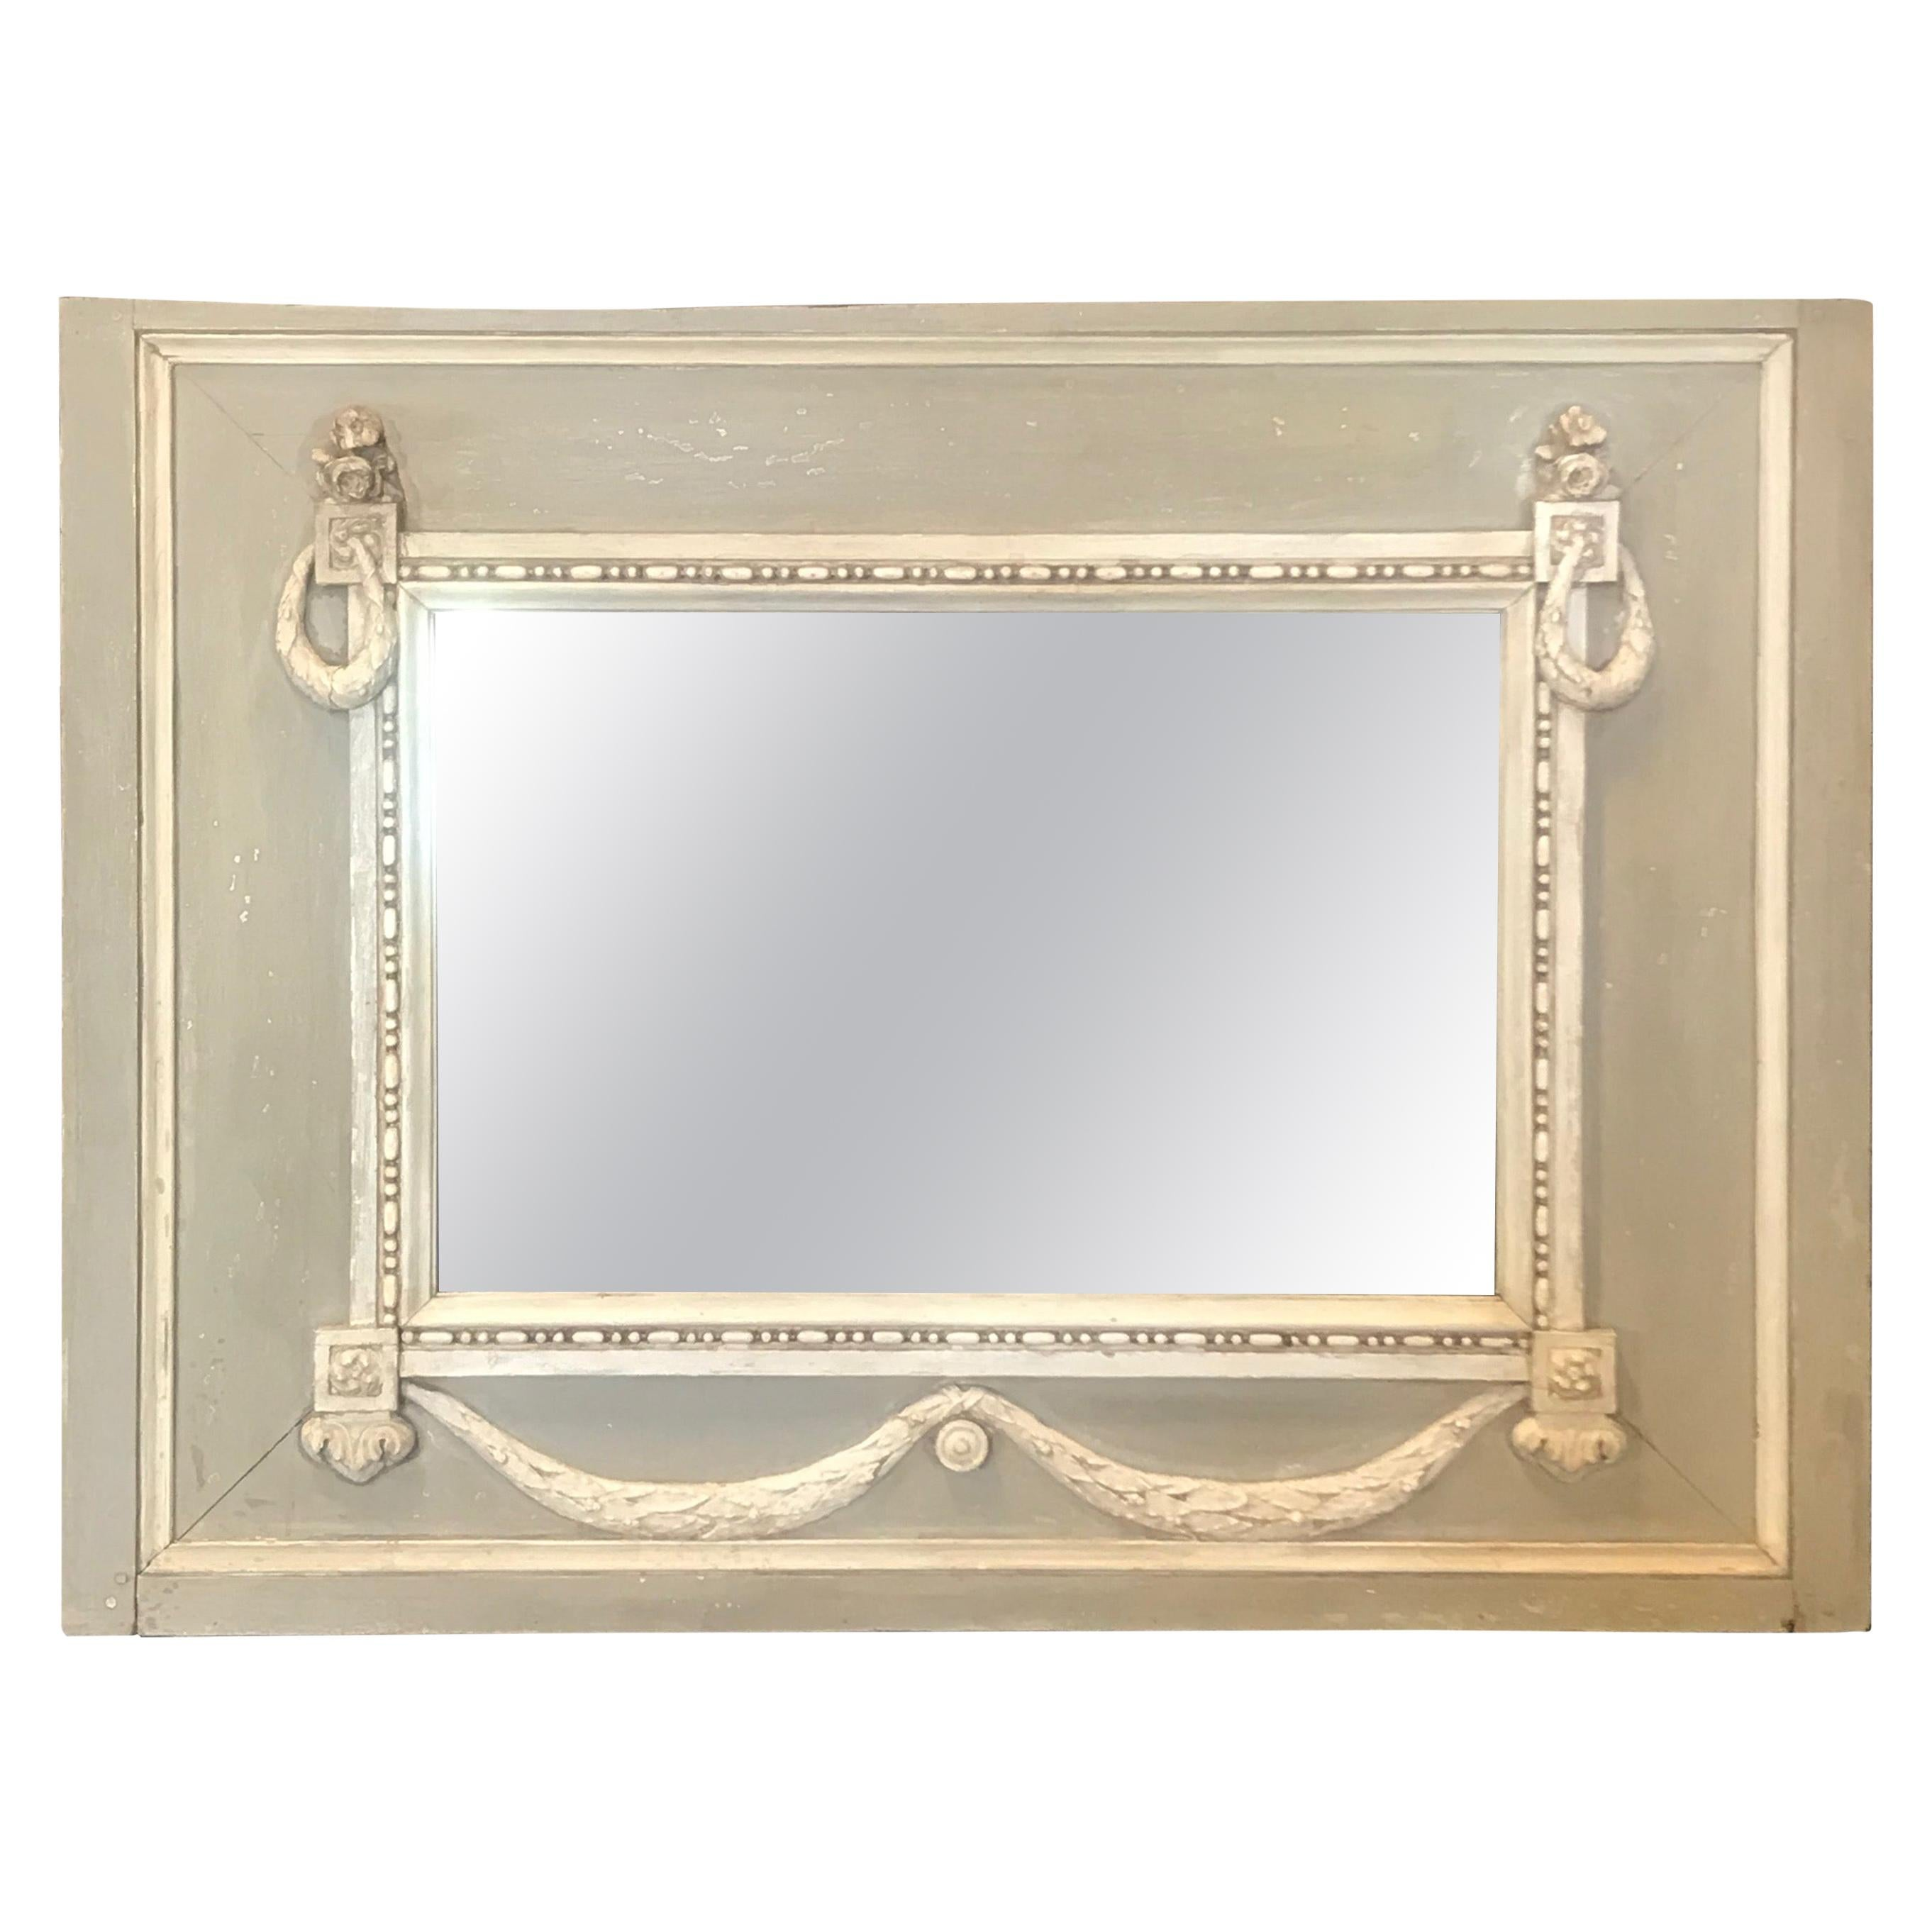 Rare Swedish Gustavian Trumeau Mirror